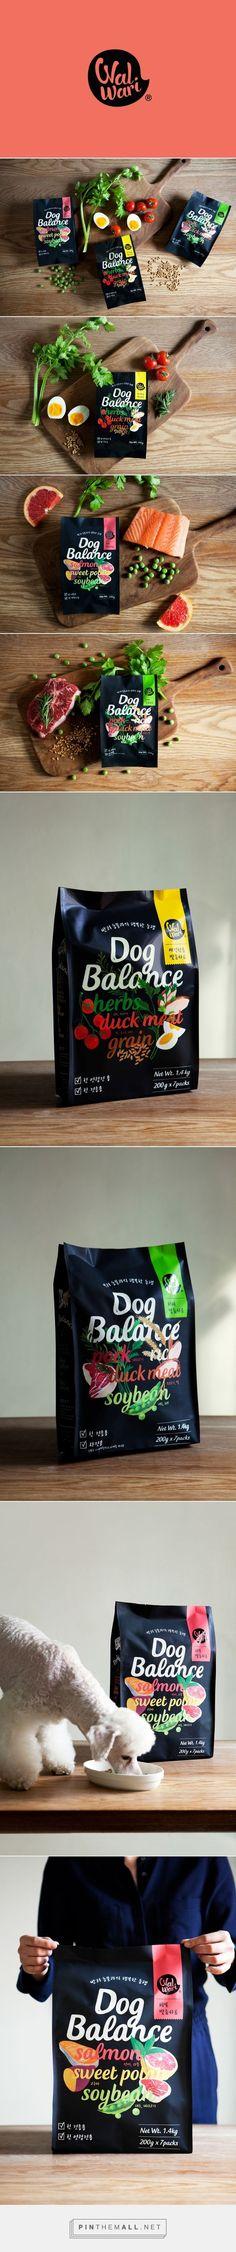 Dog Balance on Behance. - a grouped images picture Dog Balance / pet food by Charry Jeon, Saerom Kang, ContentFormContext, KIWOONG HONG Make Dog Food, Wet Dog Food, Pet Food, Beverage Packaging, Food Packaging, Brand Packaging, Food Branding, Logo Food, Branding Design